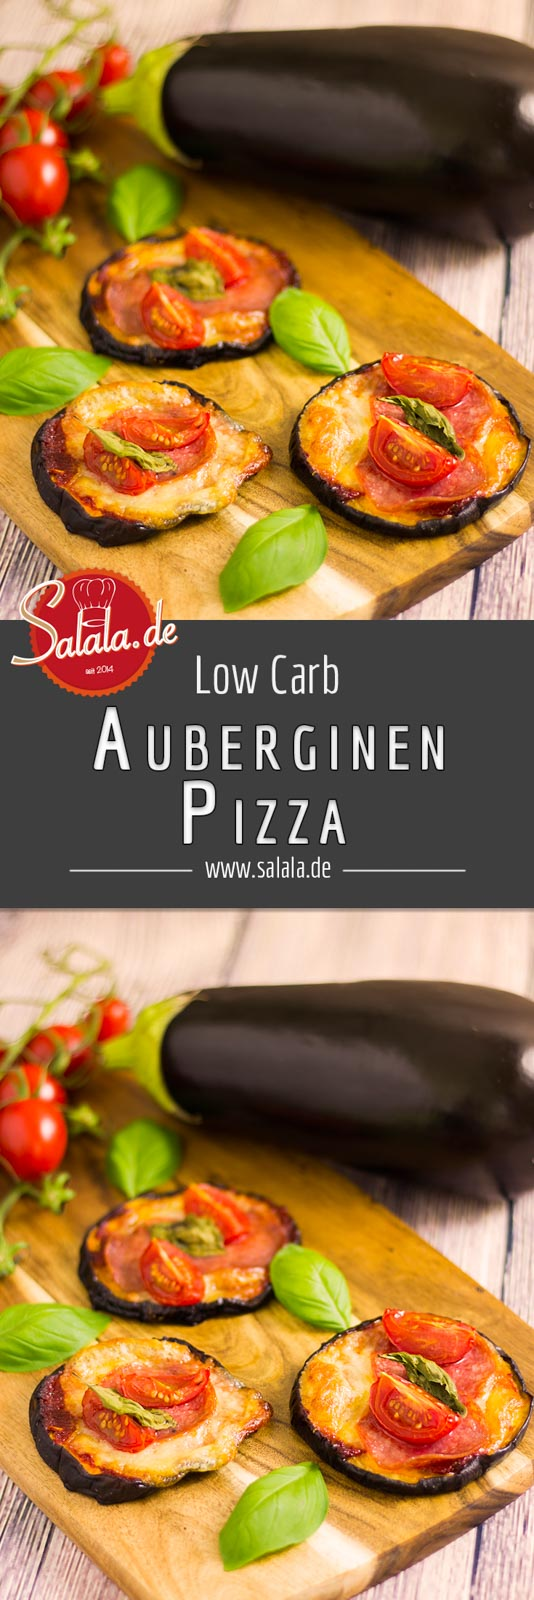 Auberginen Pizza Low Carb Pizza - by salala.de - Rezept ohne Kohlenhydrate schnell gemacht #pizza #noflour #sugarfree #zuckerfrei #keto